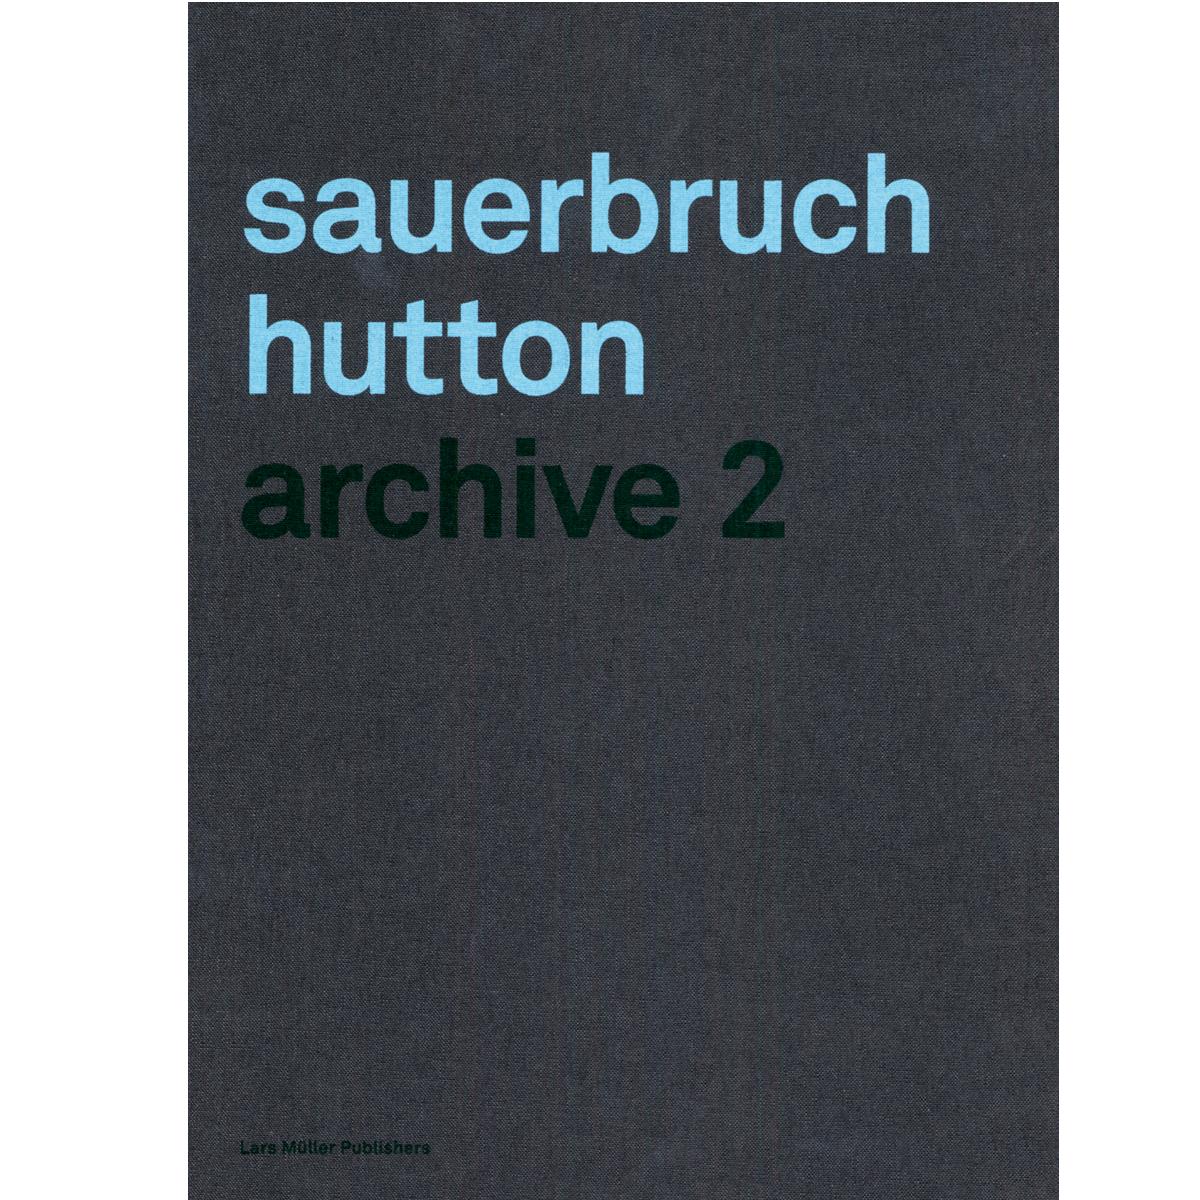 Archive 2